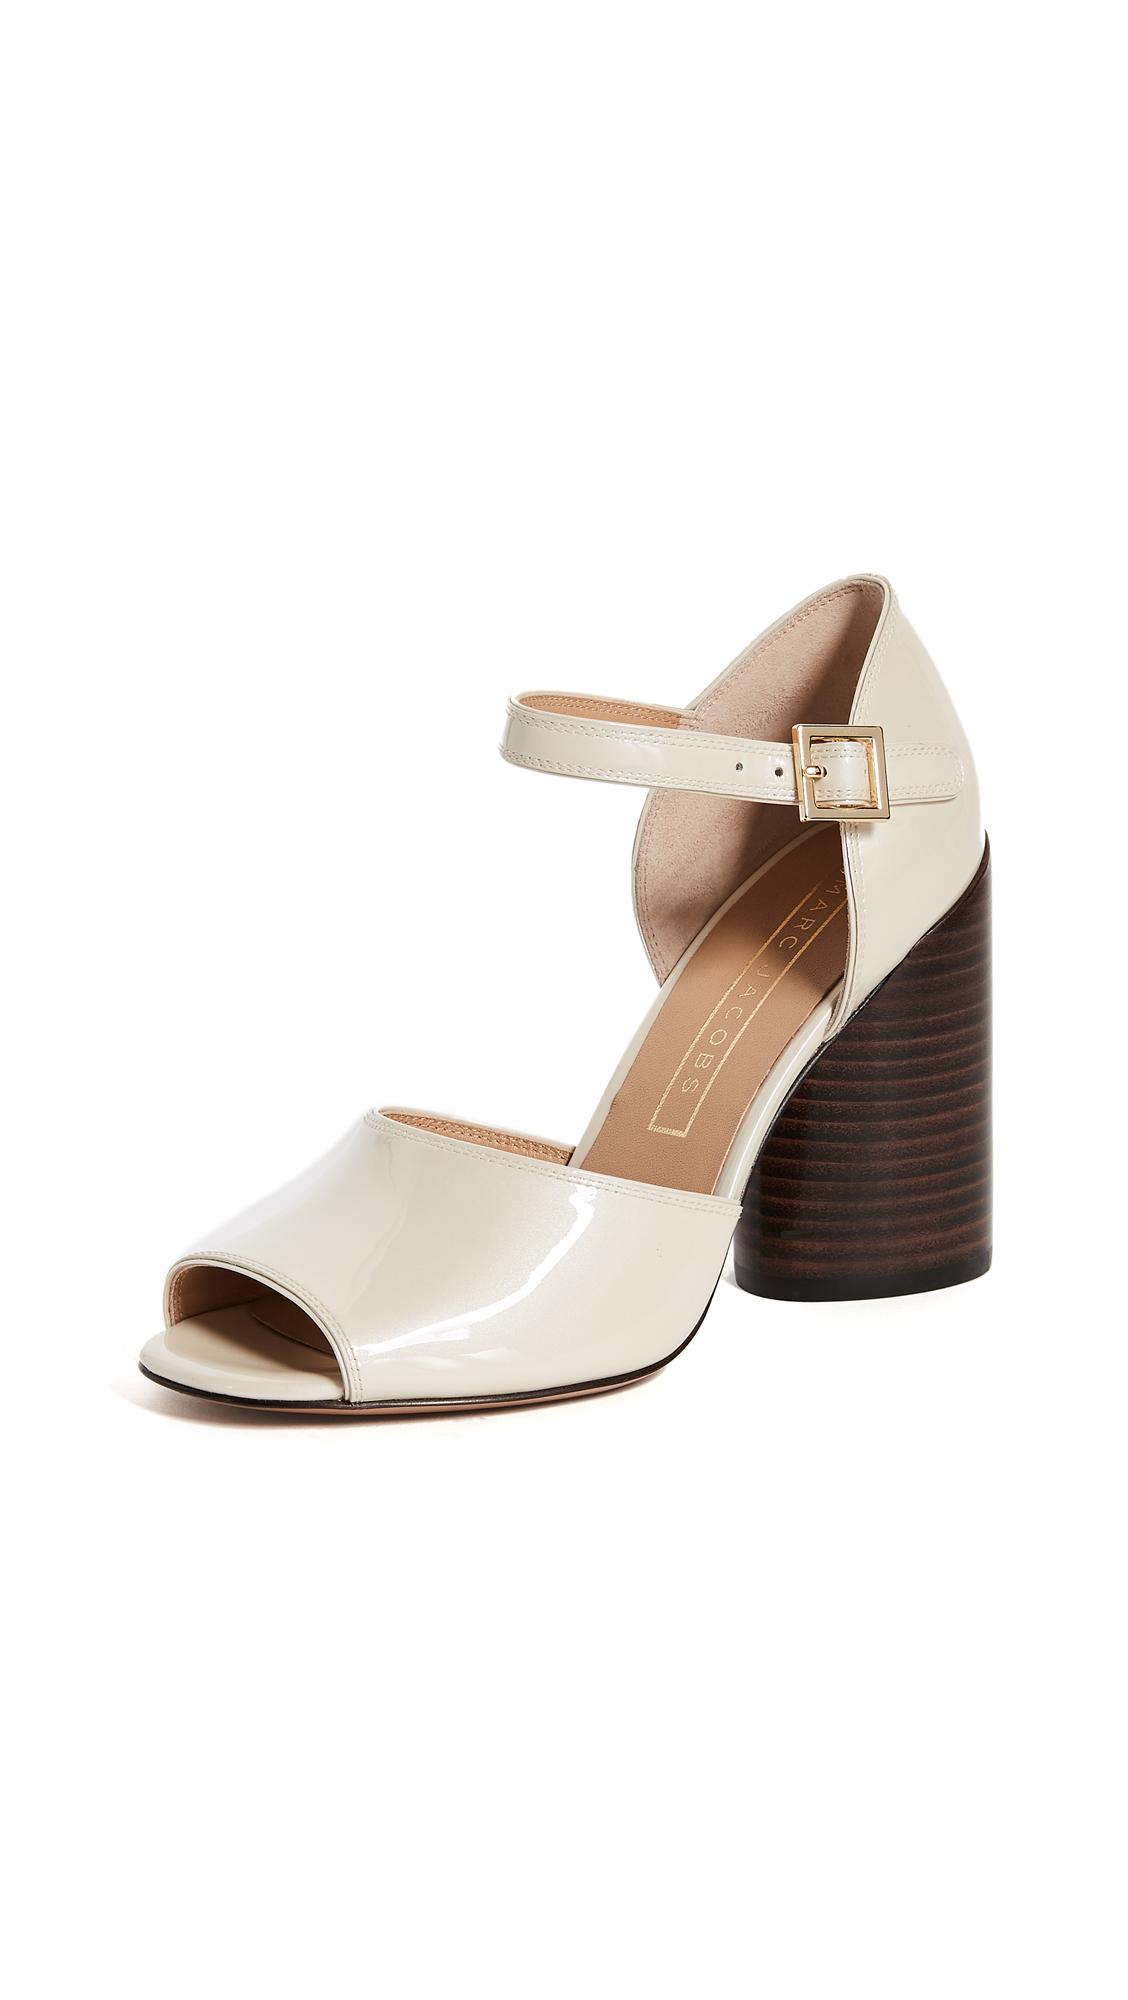 Marc Jacobs Kasia Sandals - White